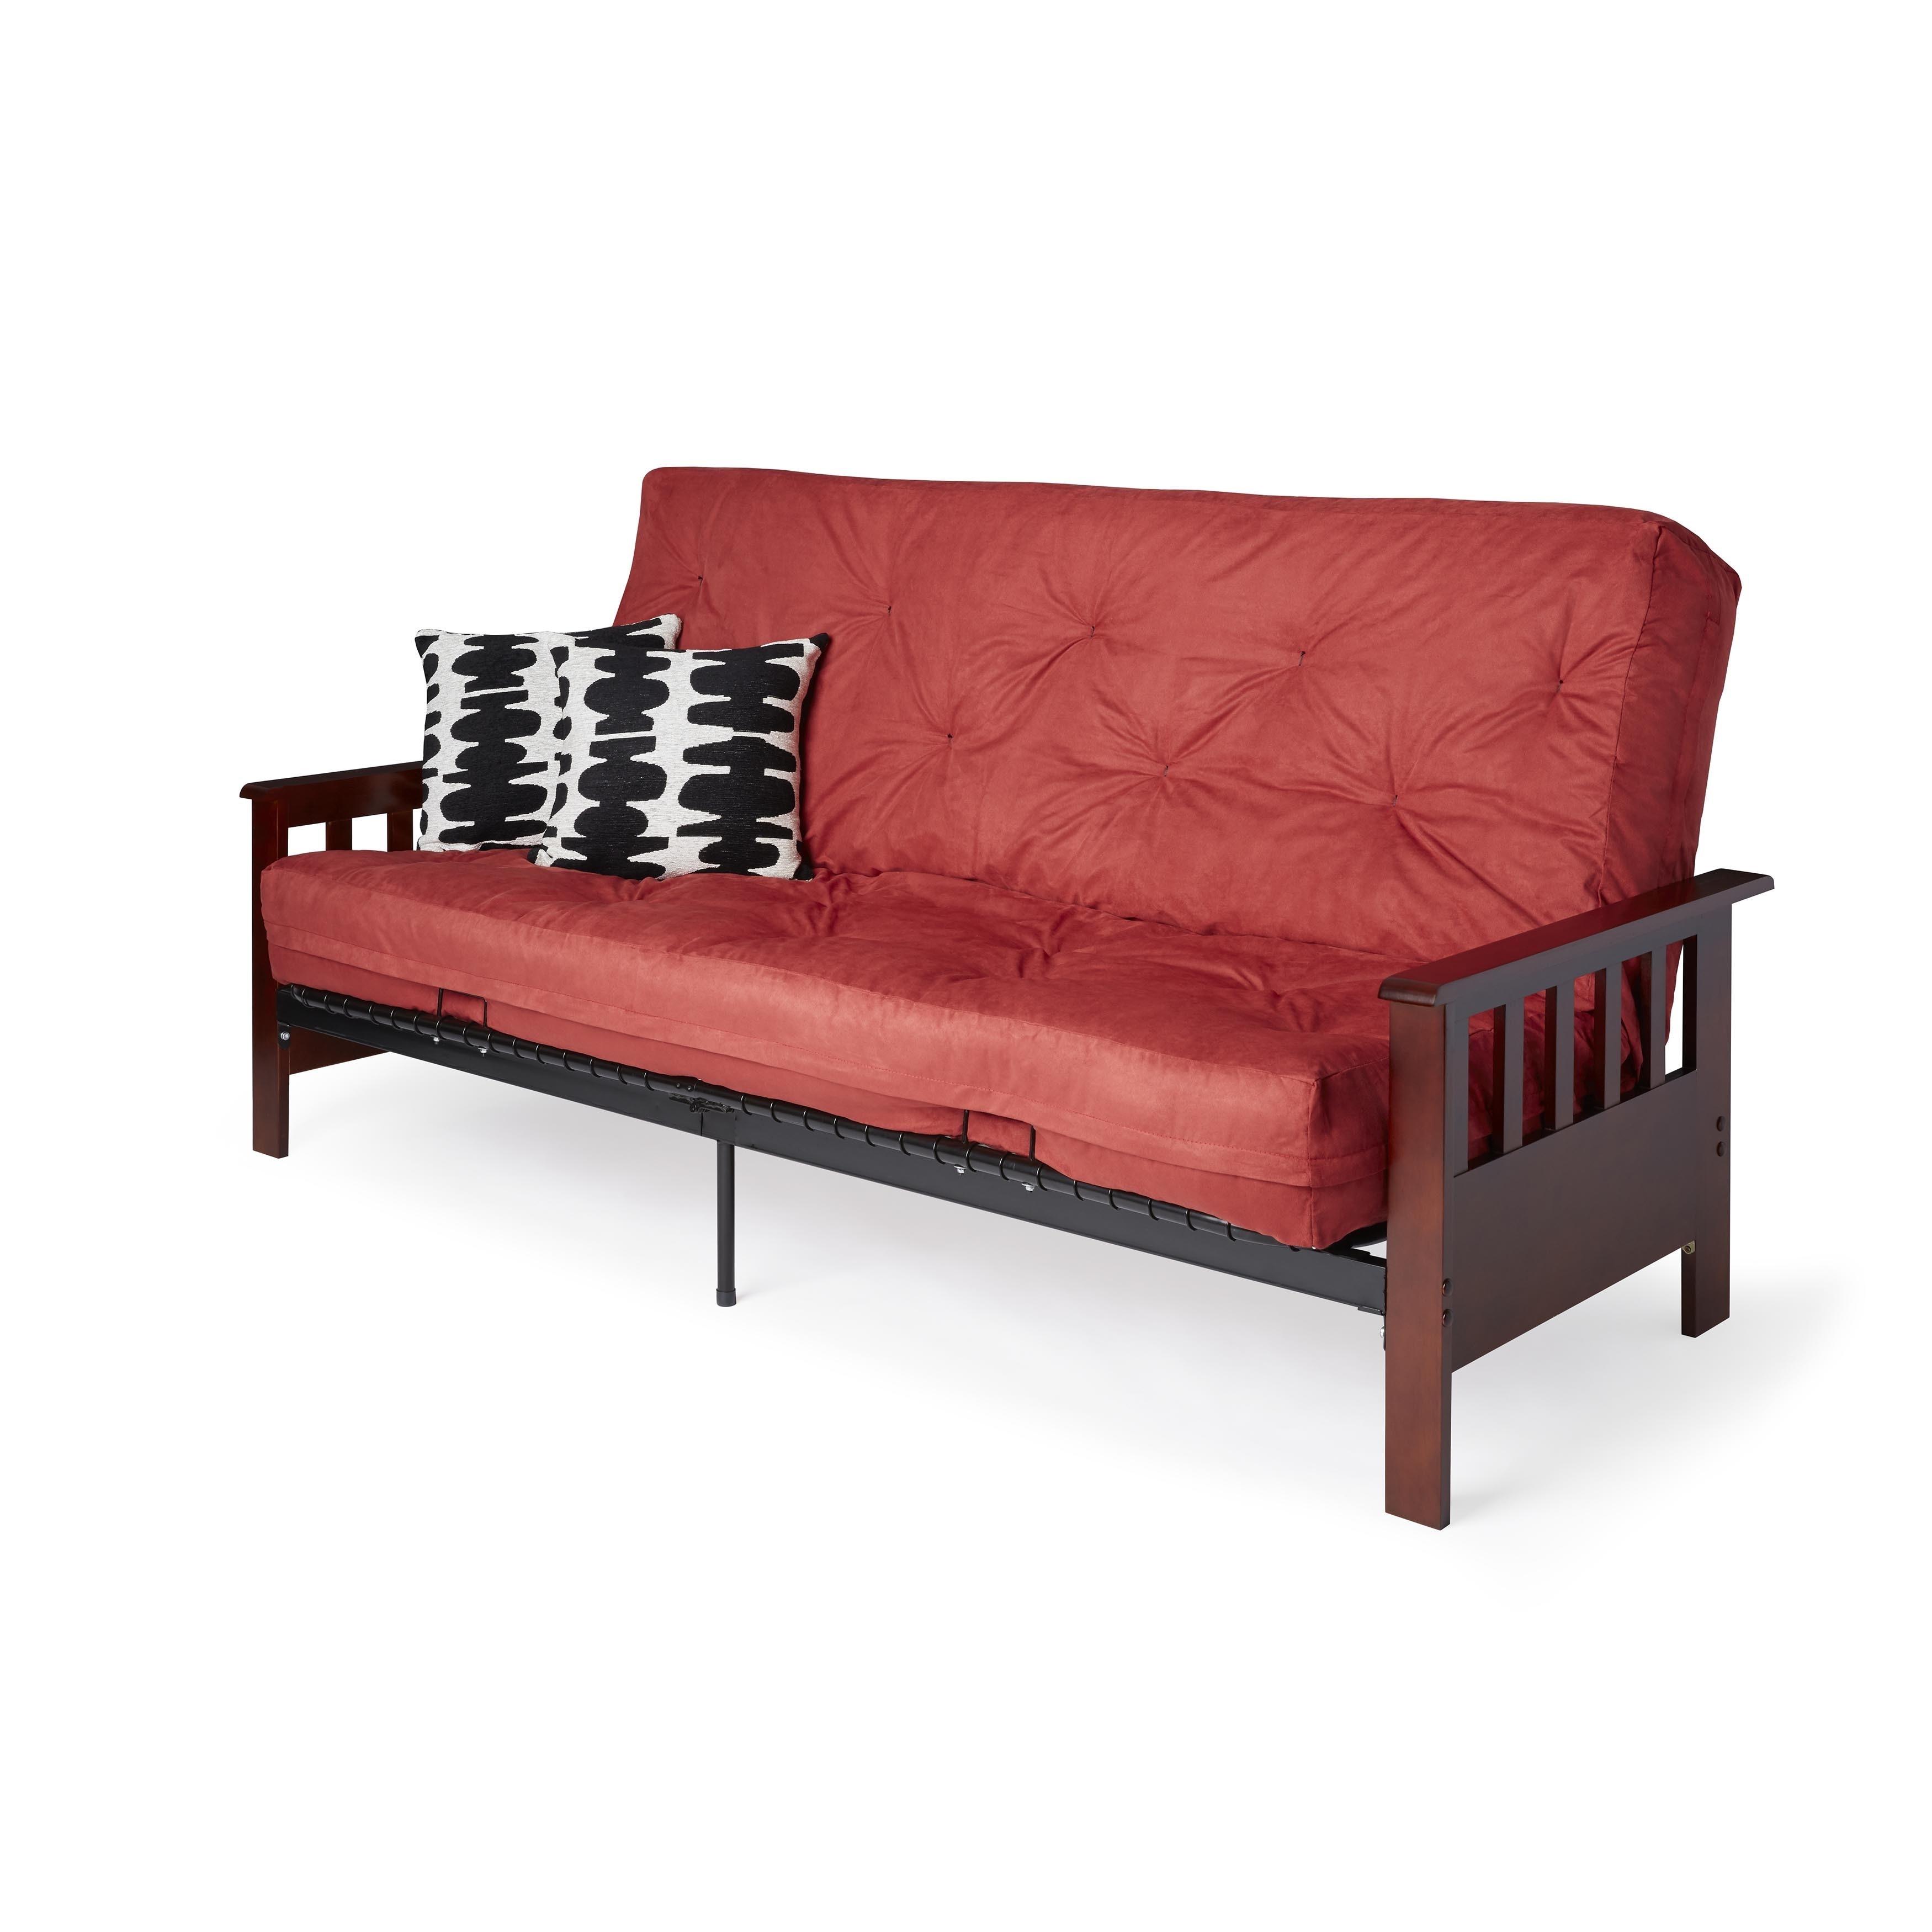 Watch Mainstays Baja Futon Sofa Sleeper Bed, Multiple Colors video